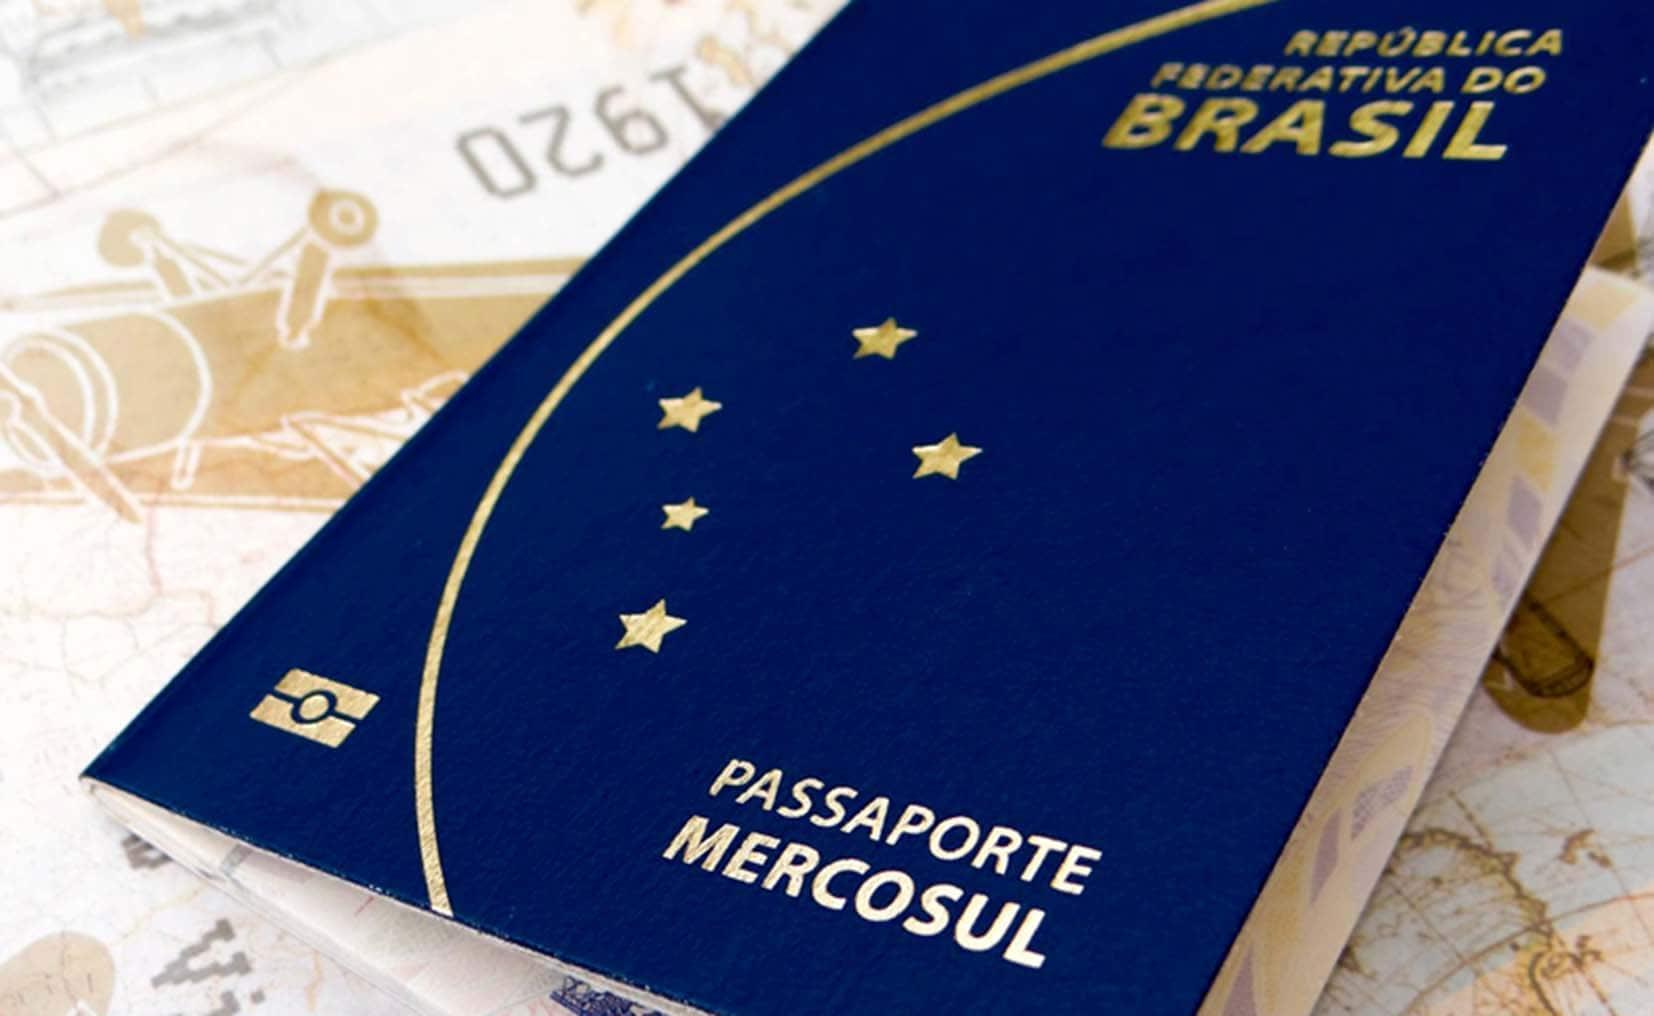 Precisa de visto para entrar no Uruguai: Passaporte brasileiro MERCOSUL